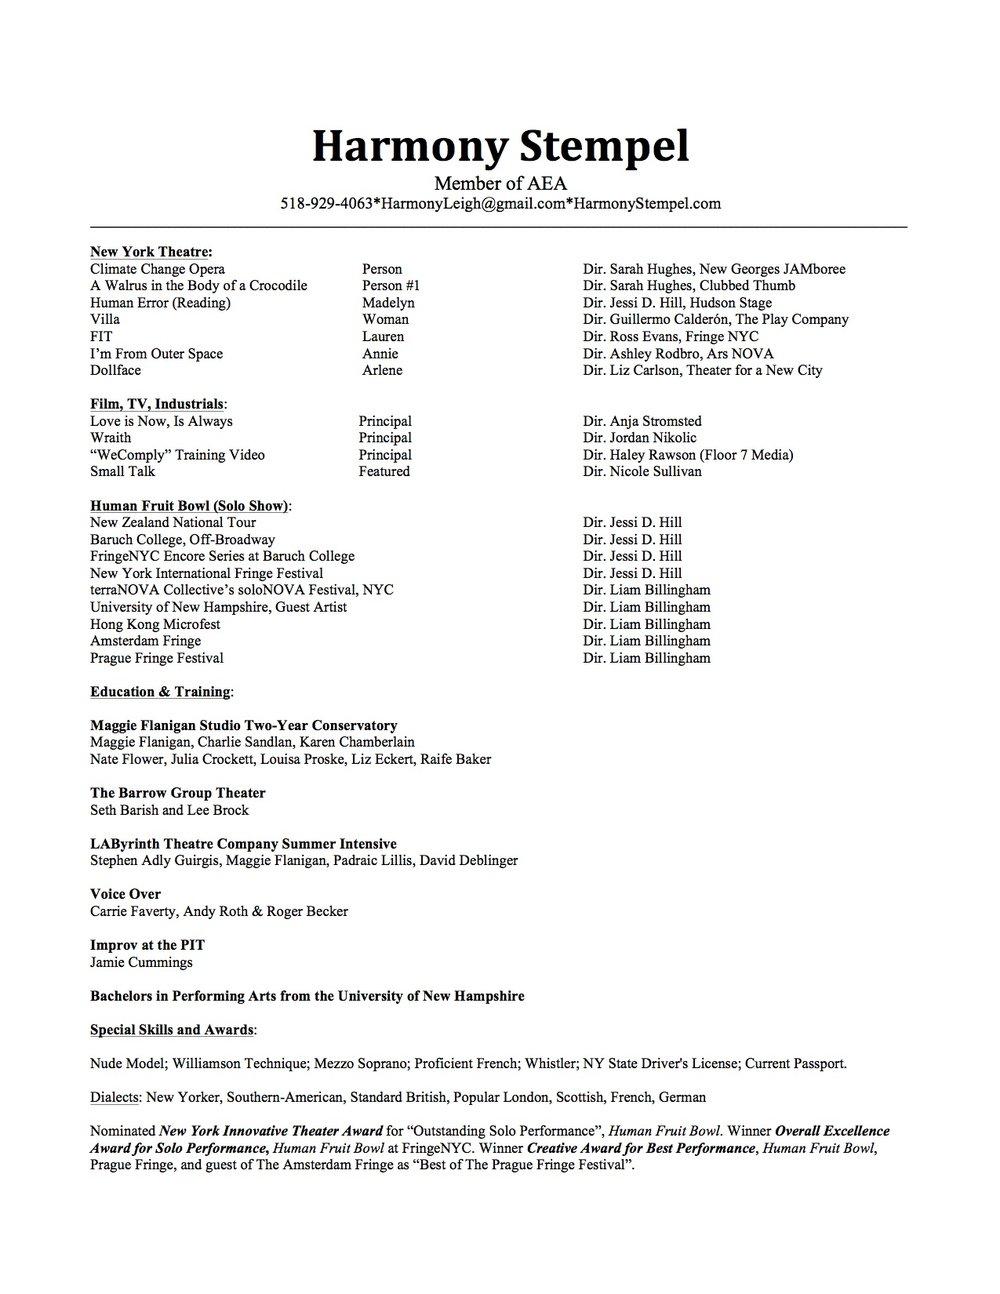 HarmonyStempelResume.jpg